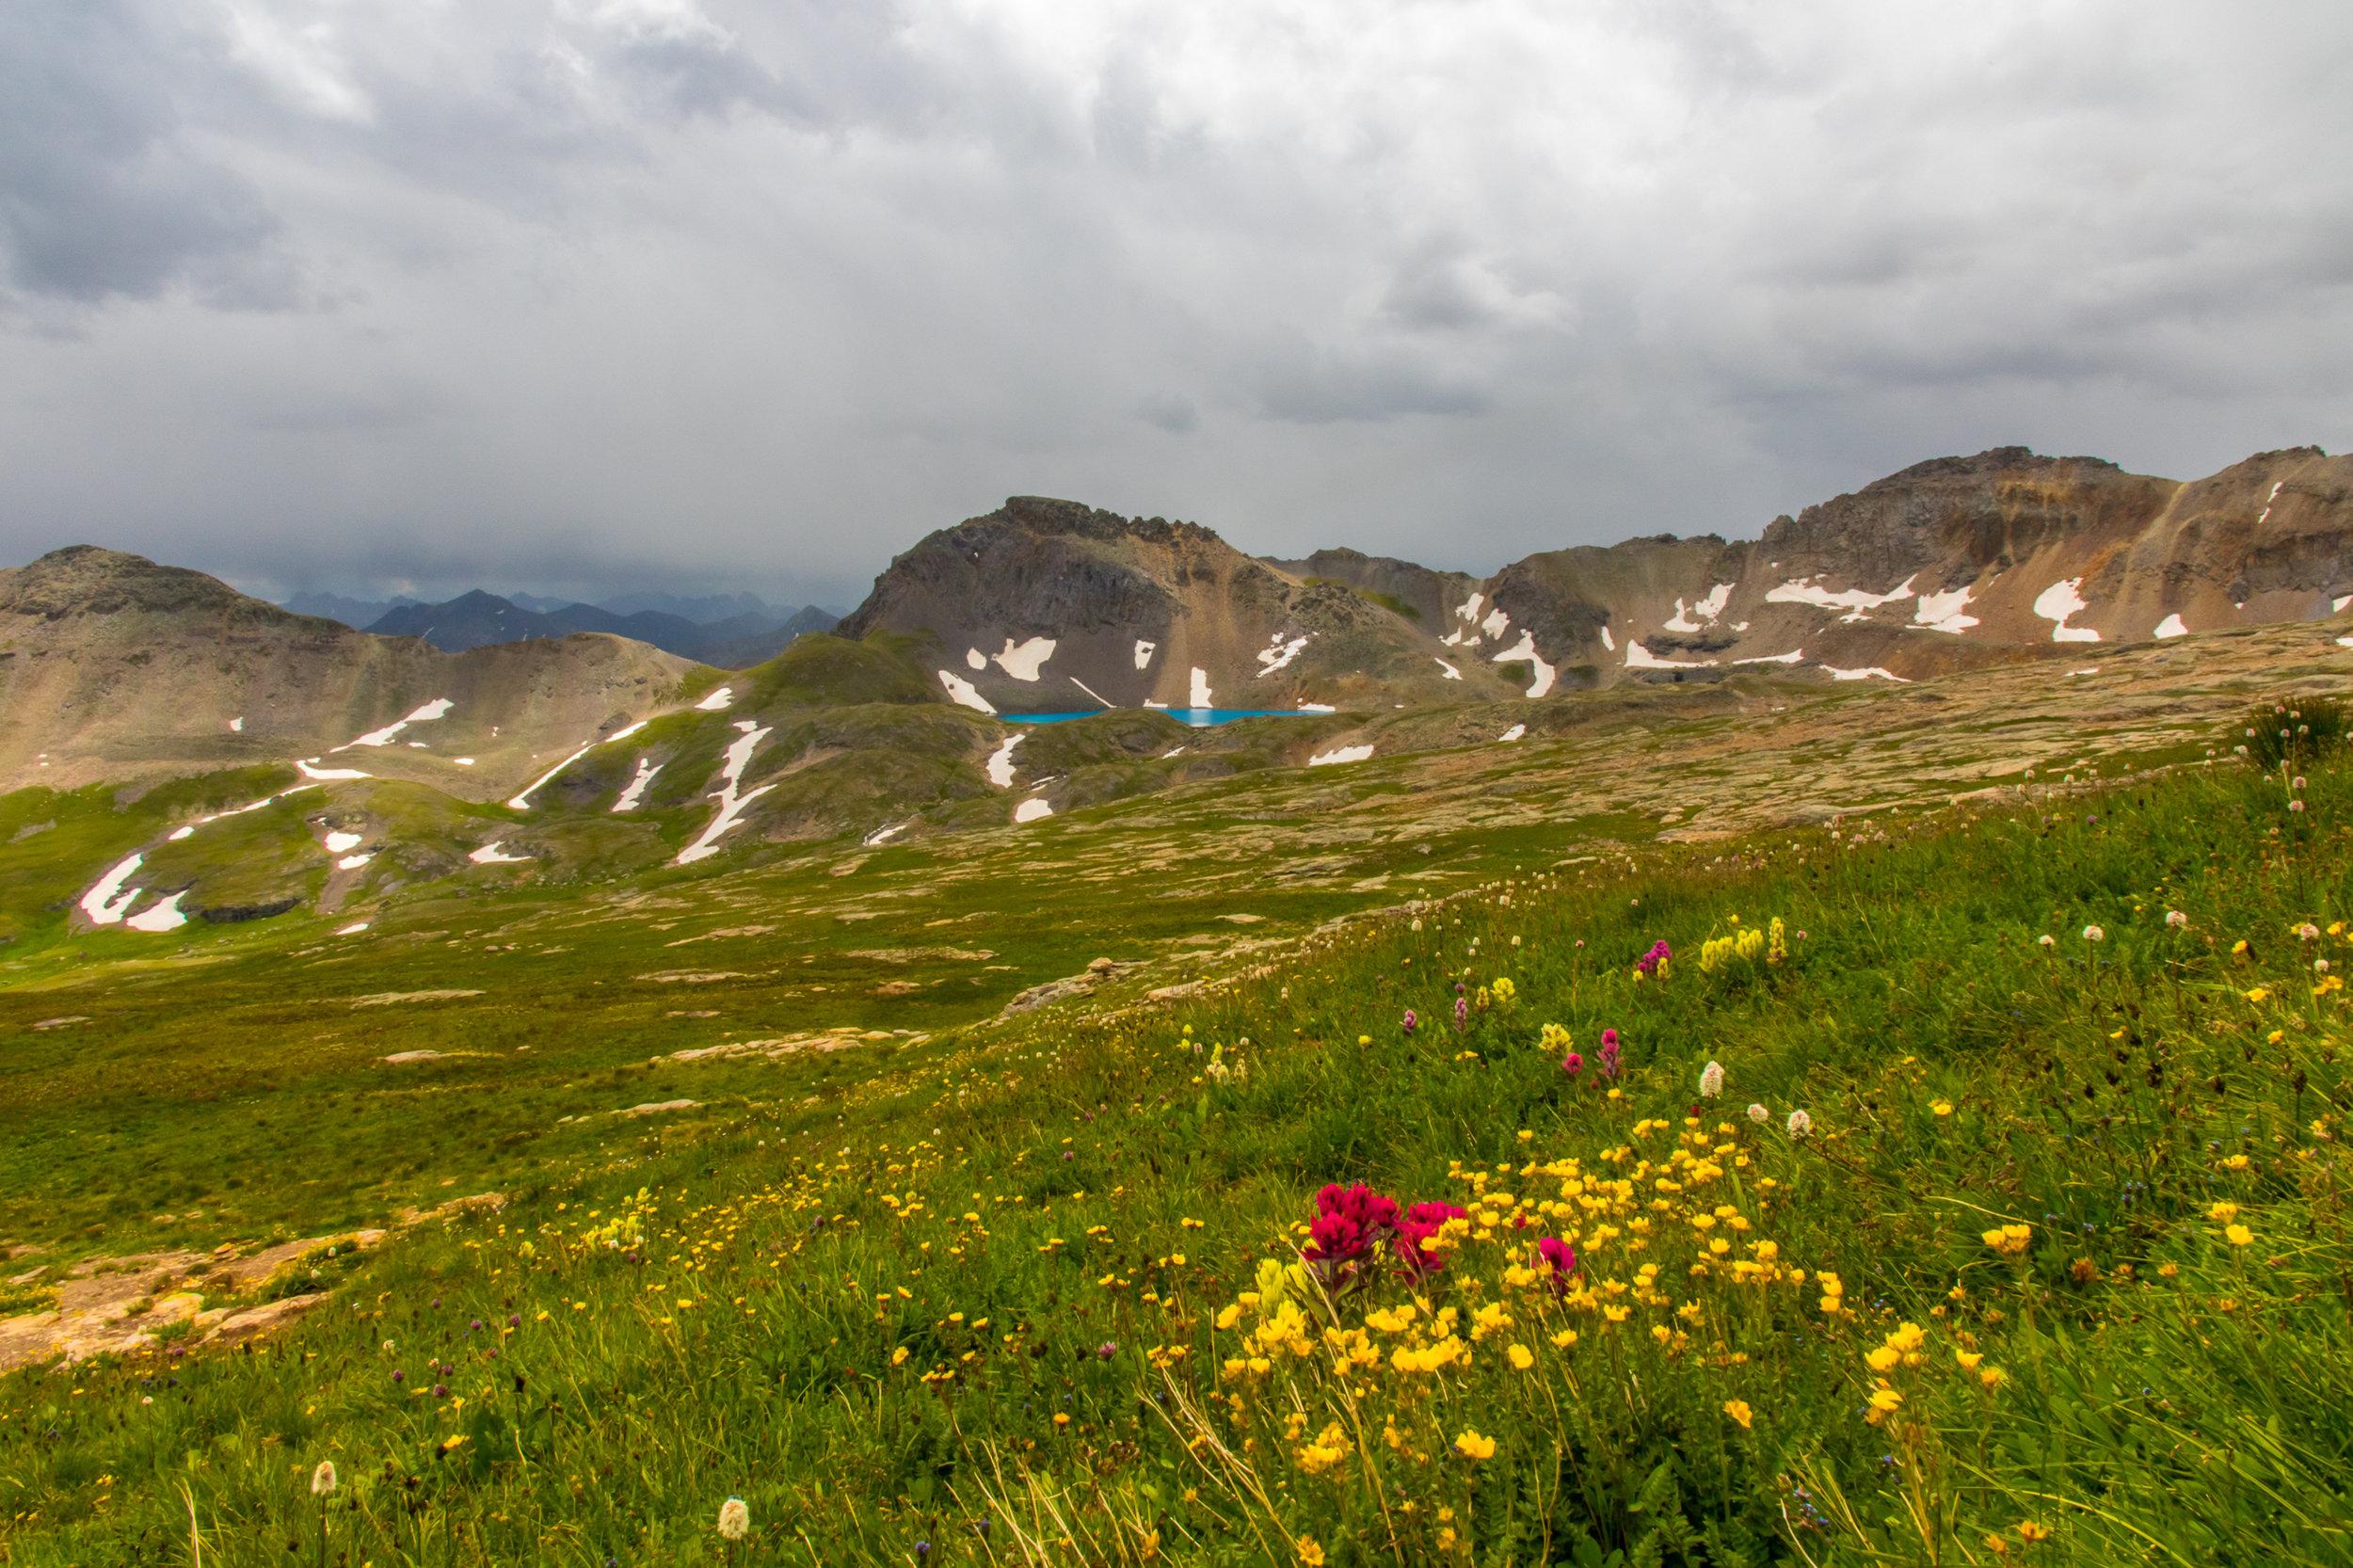 Wildflowers on trail toward Columbine Pass and Lake